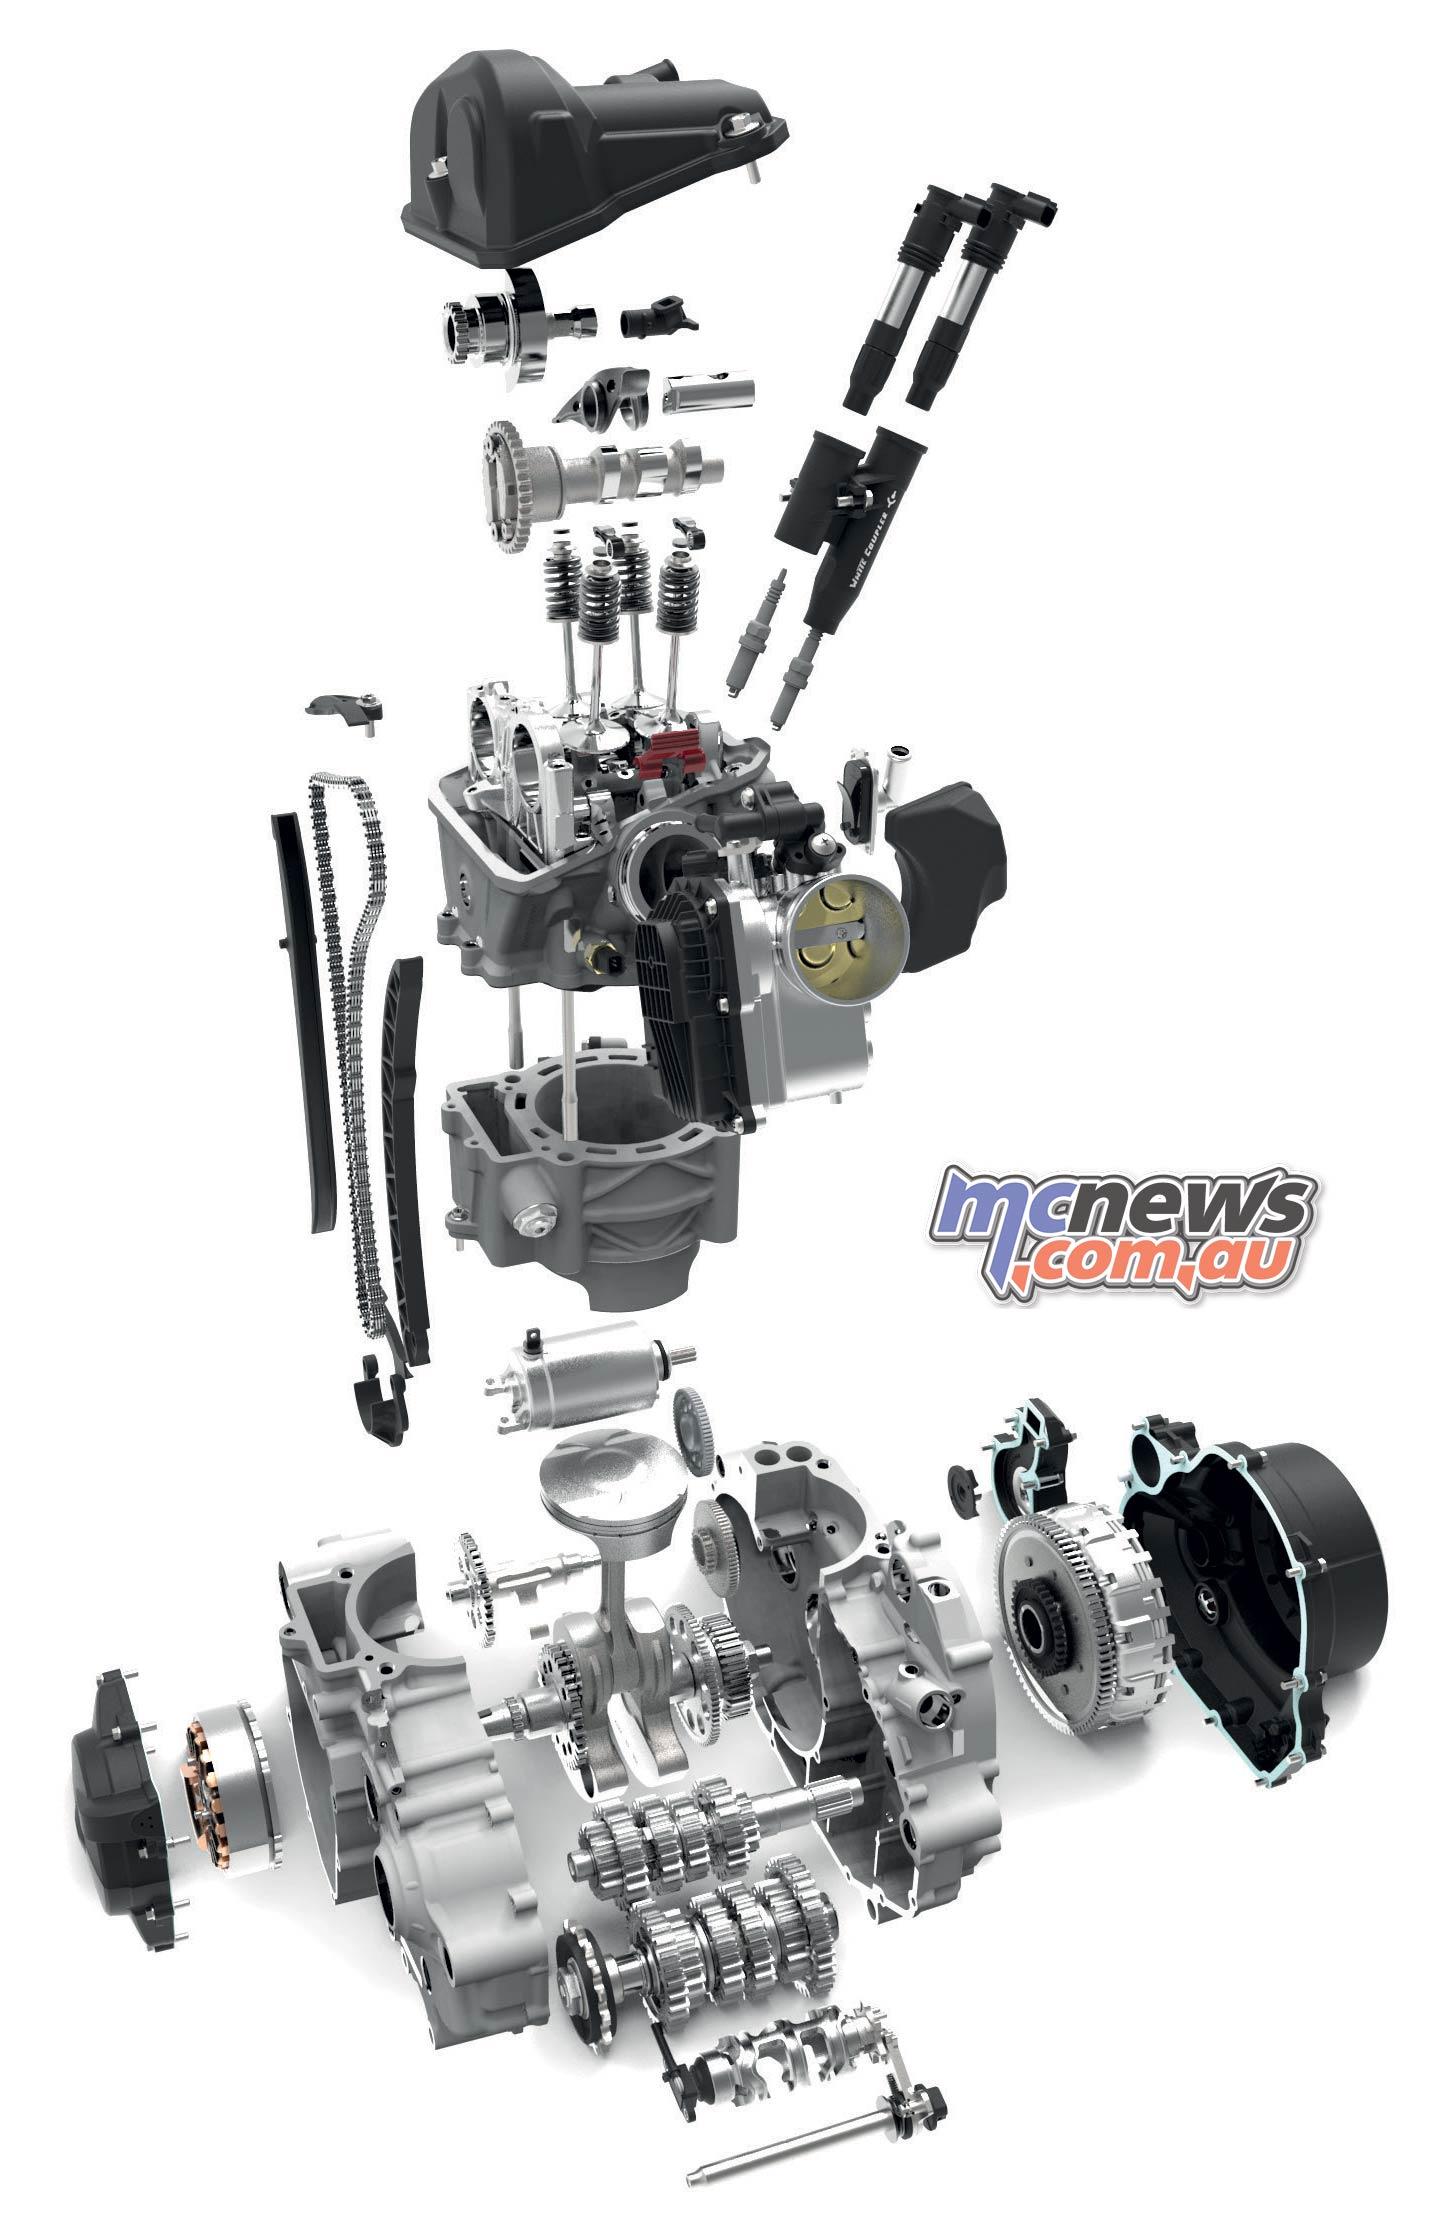 Ktm 690 Enduro R Reviewed